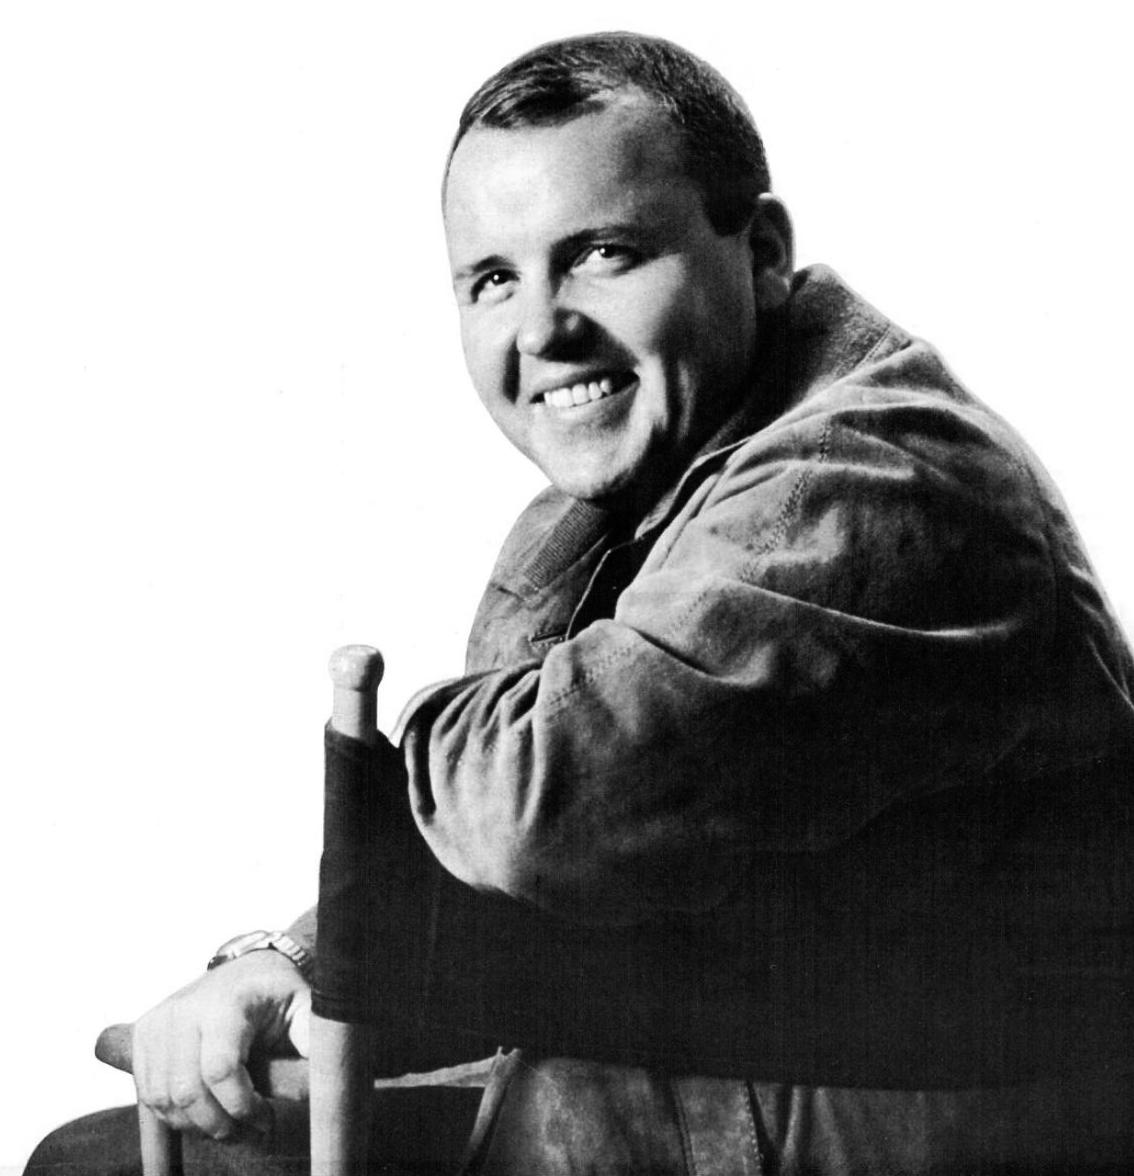 Glenn Yarbrough, a singing voice silenced